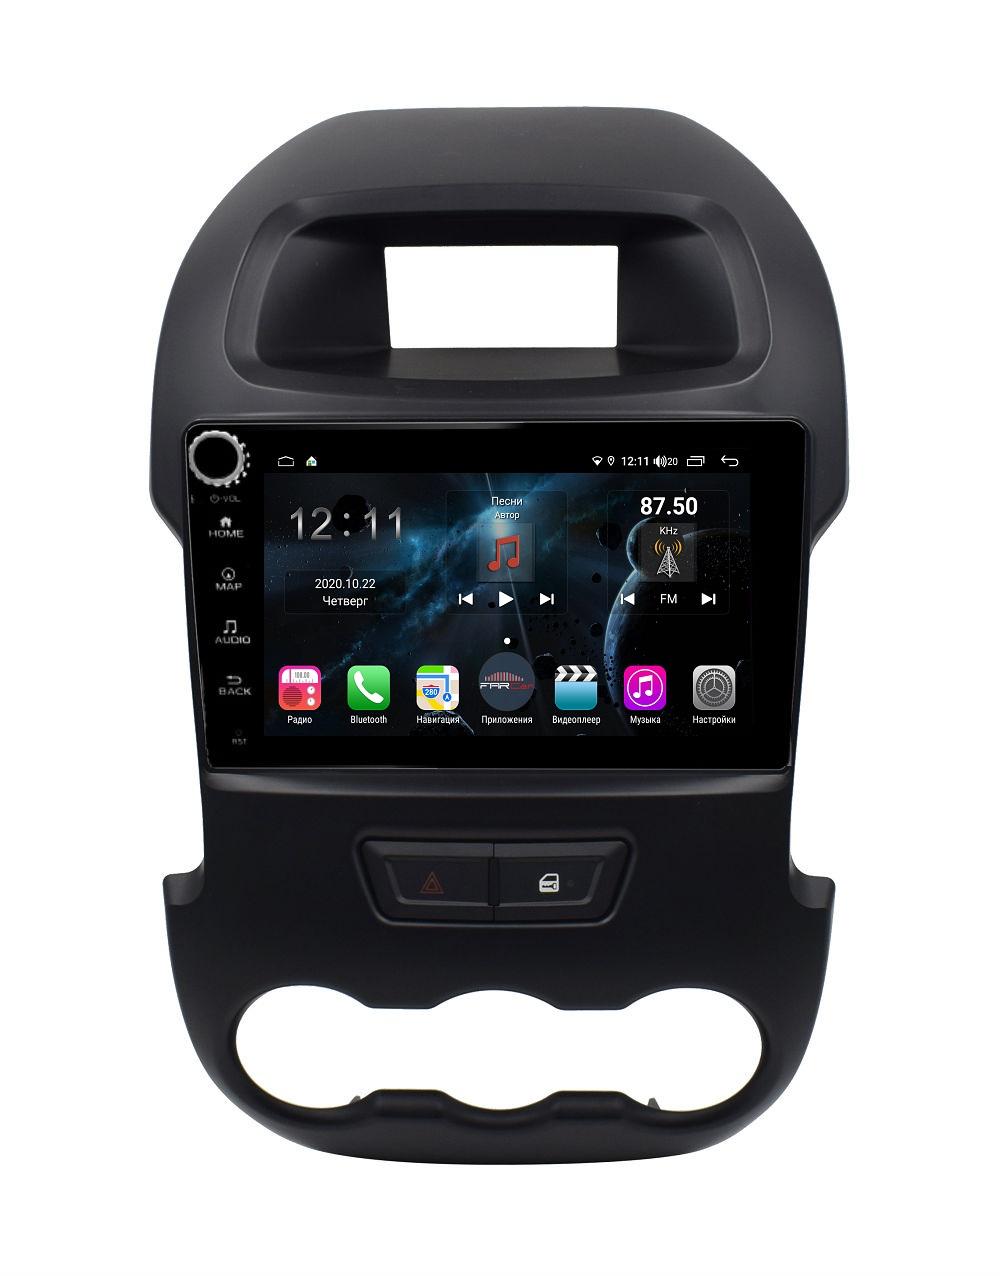 Штатная магнитола FarCar s400 для Ford Ranger на Android (H245RB) (+ Камера заднего вида в подарок!)